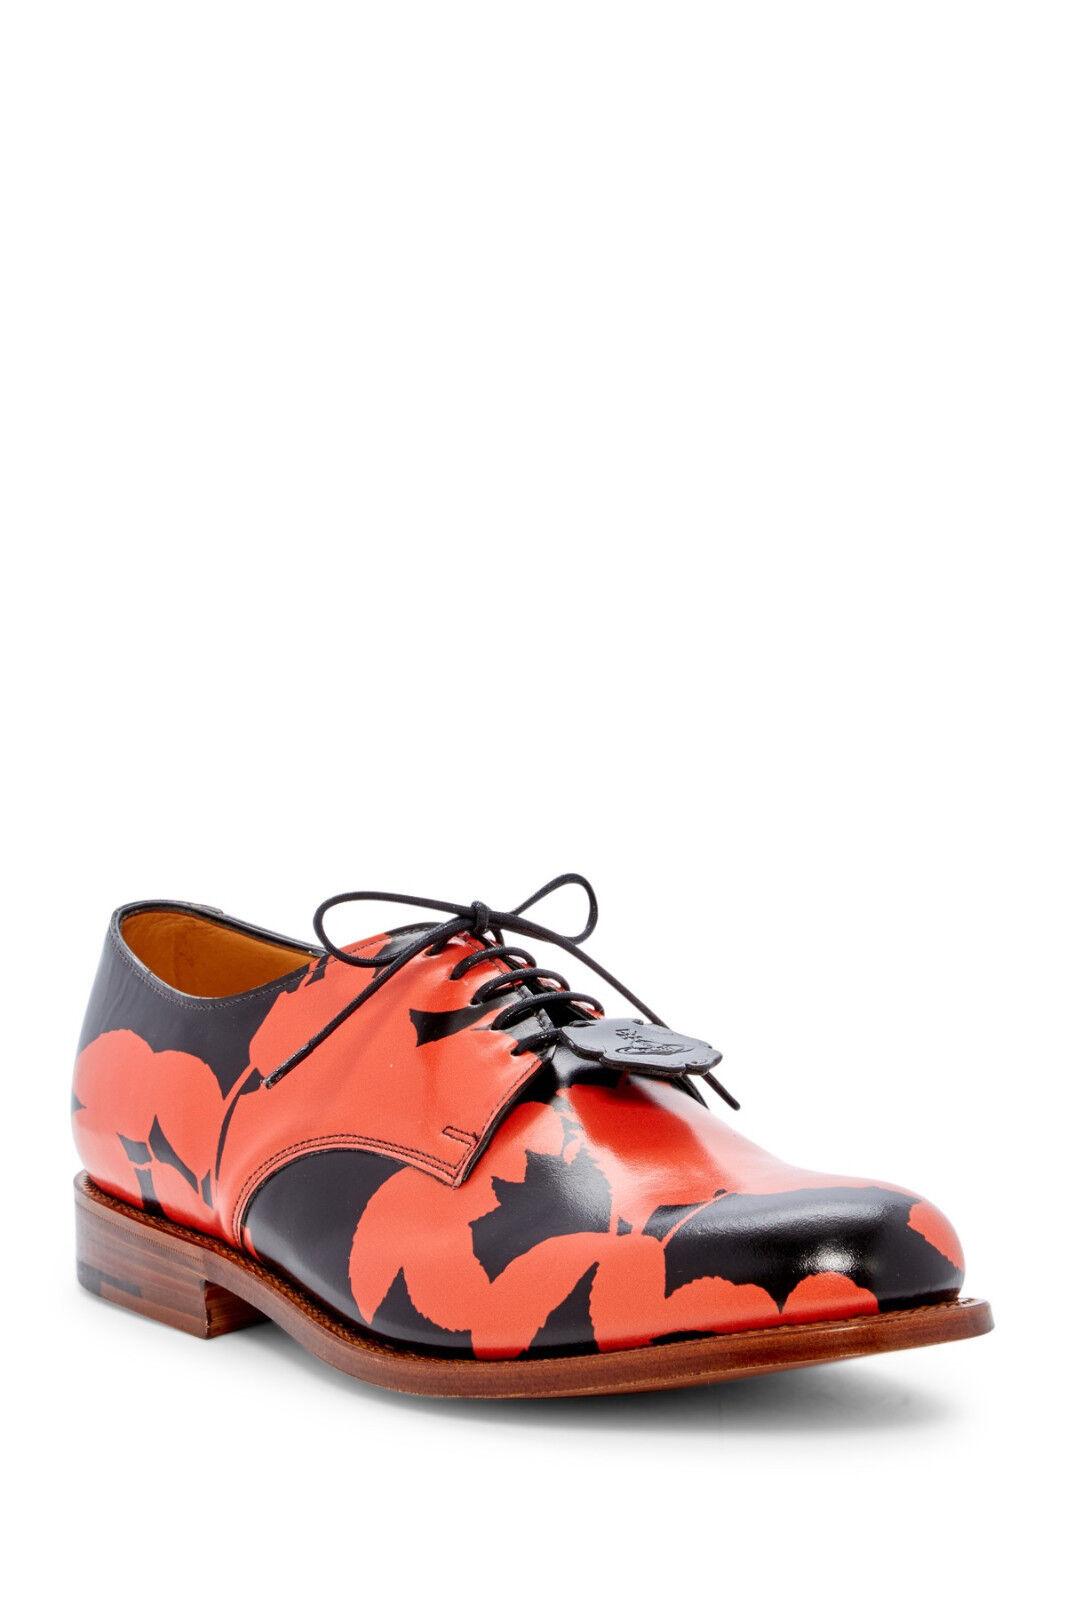 marchio in liquidazione  905 Authentic VIVIENNE WESTWOOD Uomo Multi-Squiggle Derby Lace up up up Formal scarpe  risparmia fino al 50%